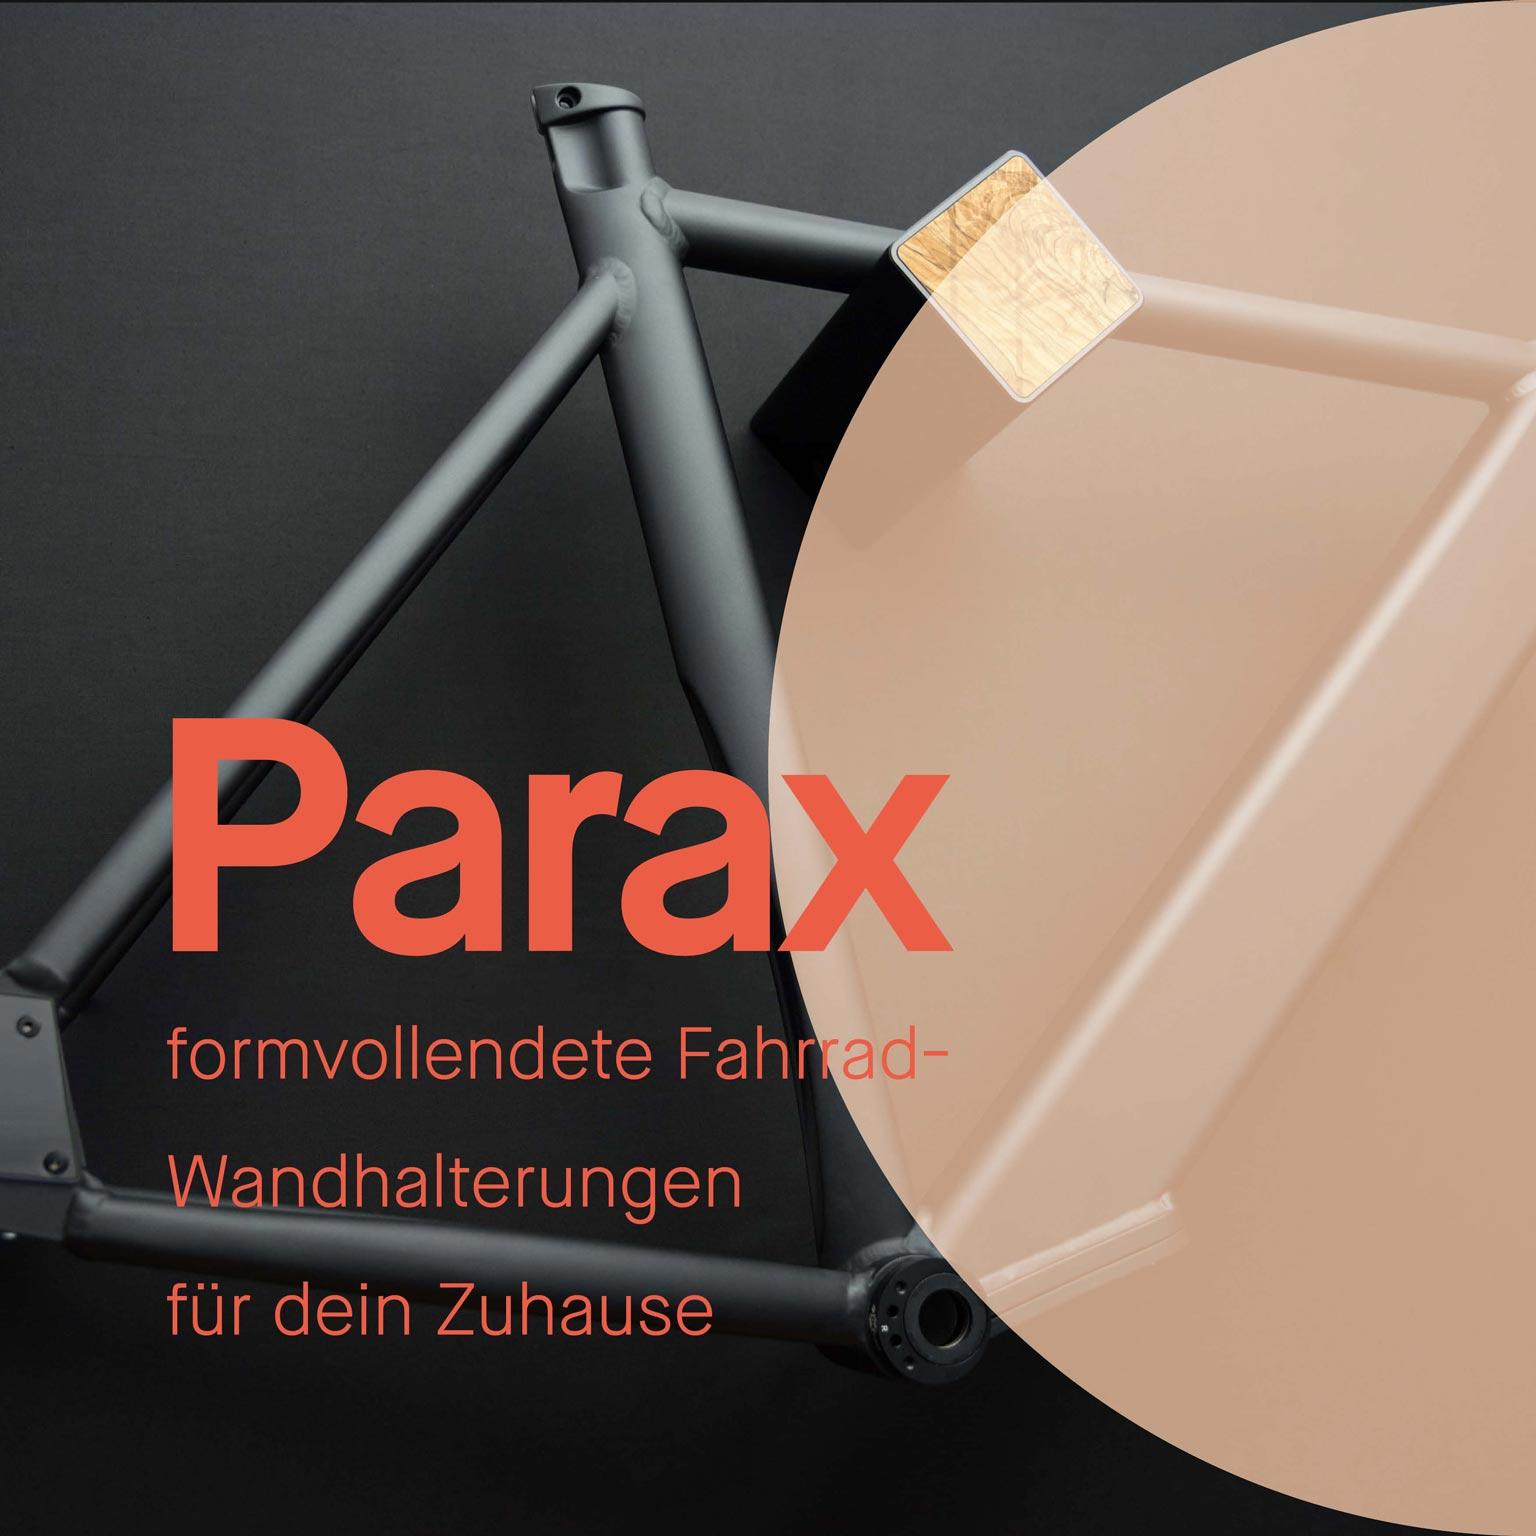 ew-banner-parax-mobil